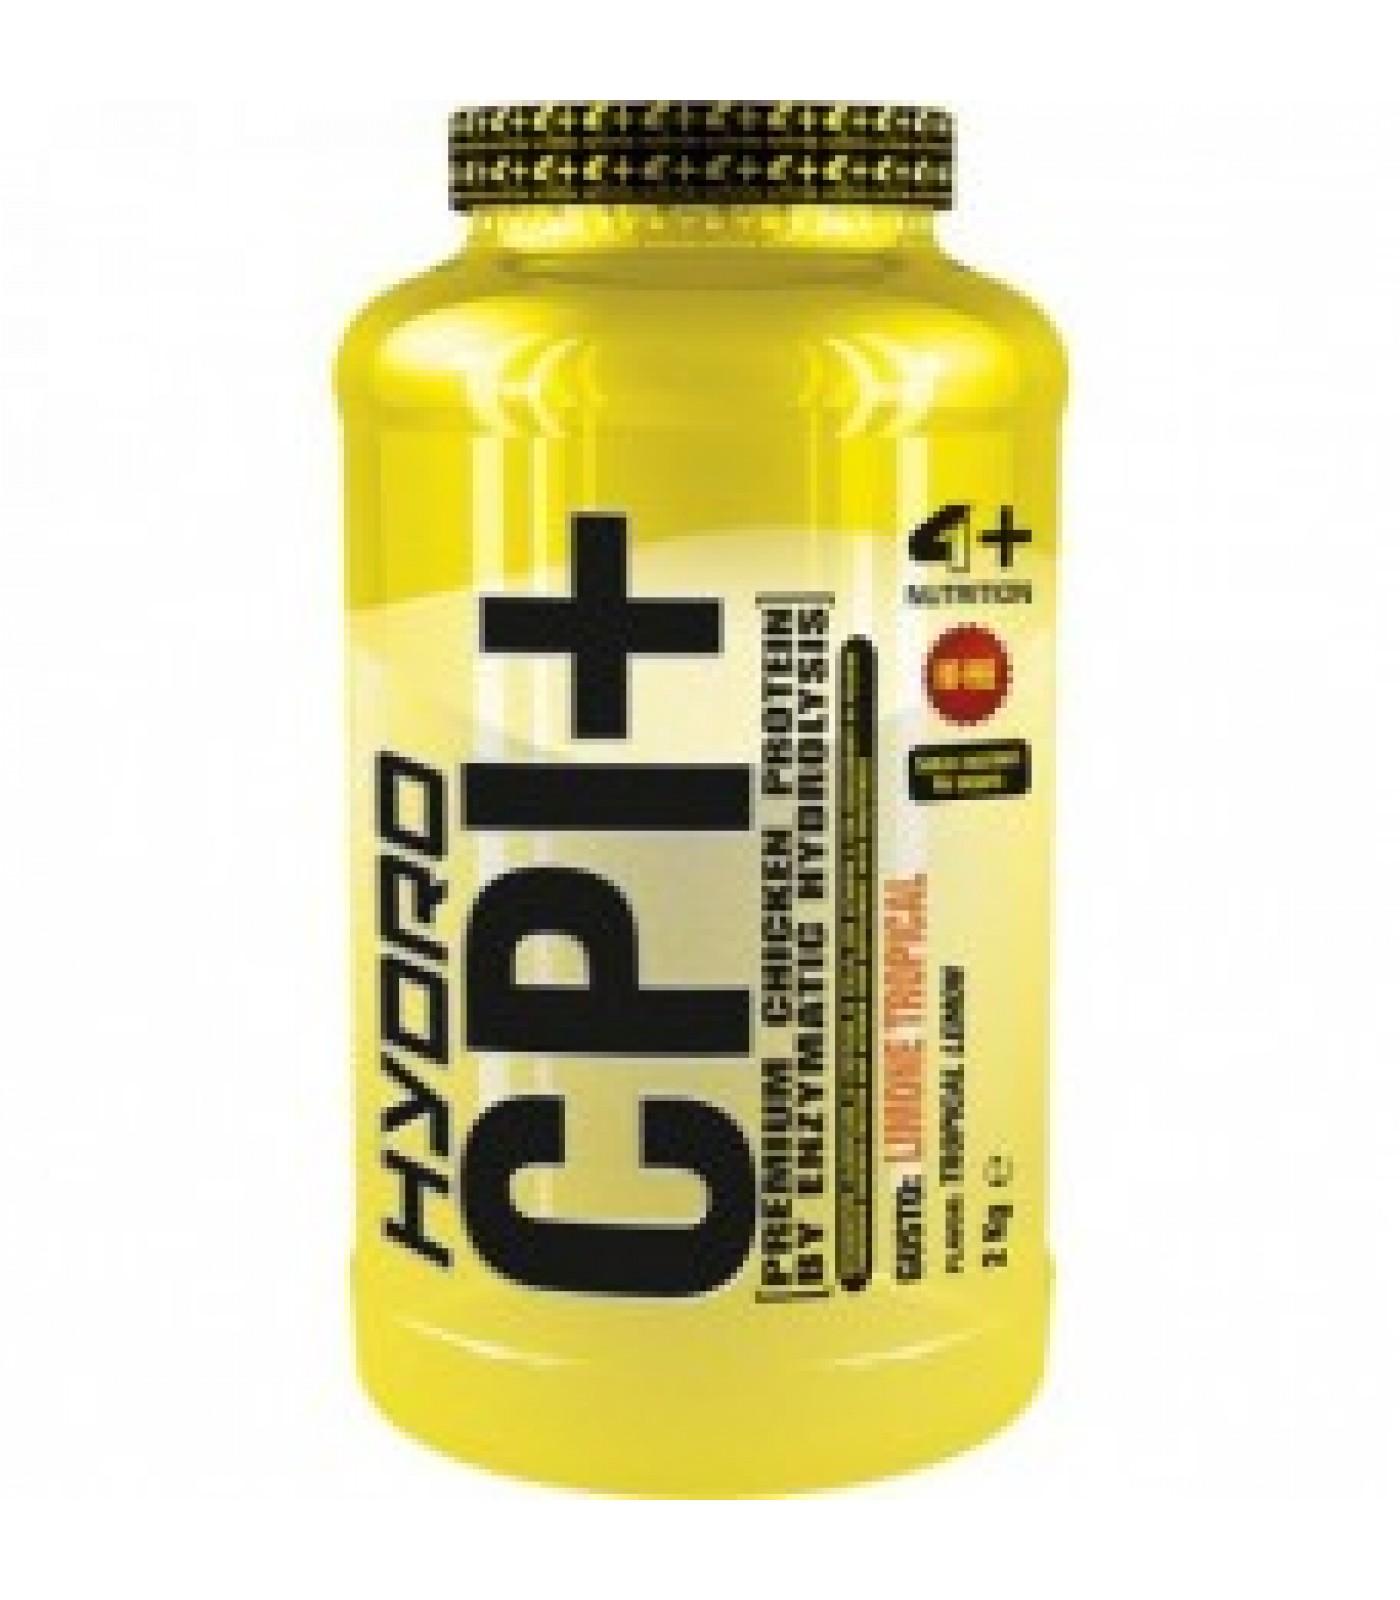 4+ Nutrition Hydro CPI+ 2 кг